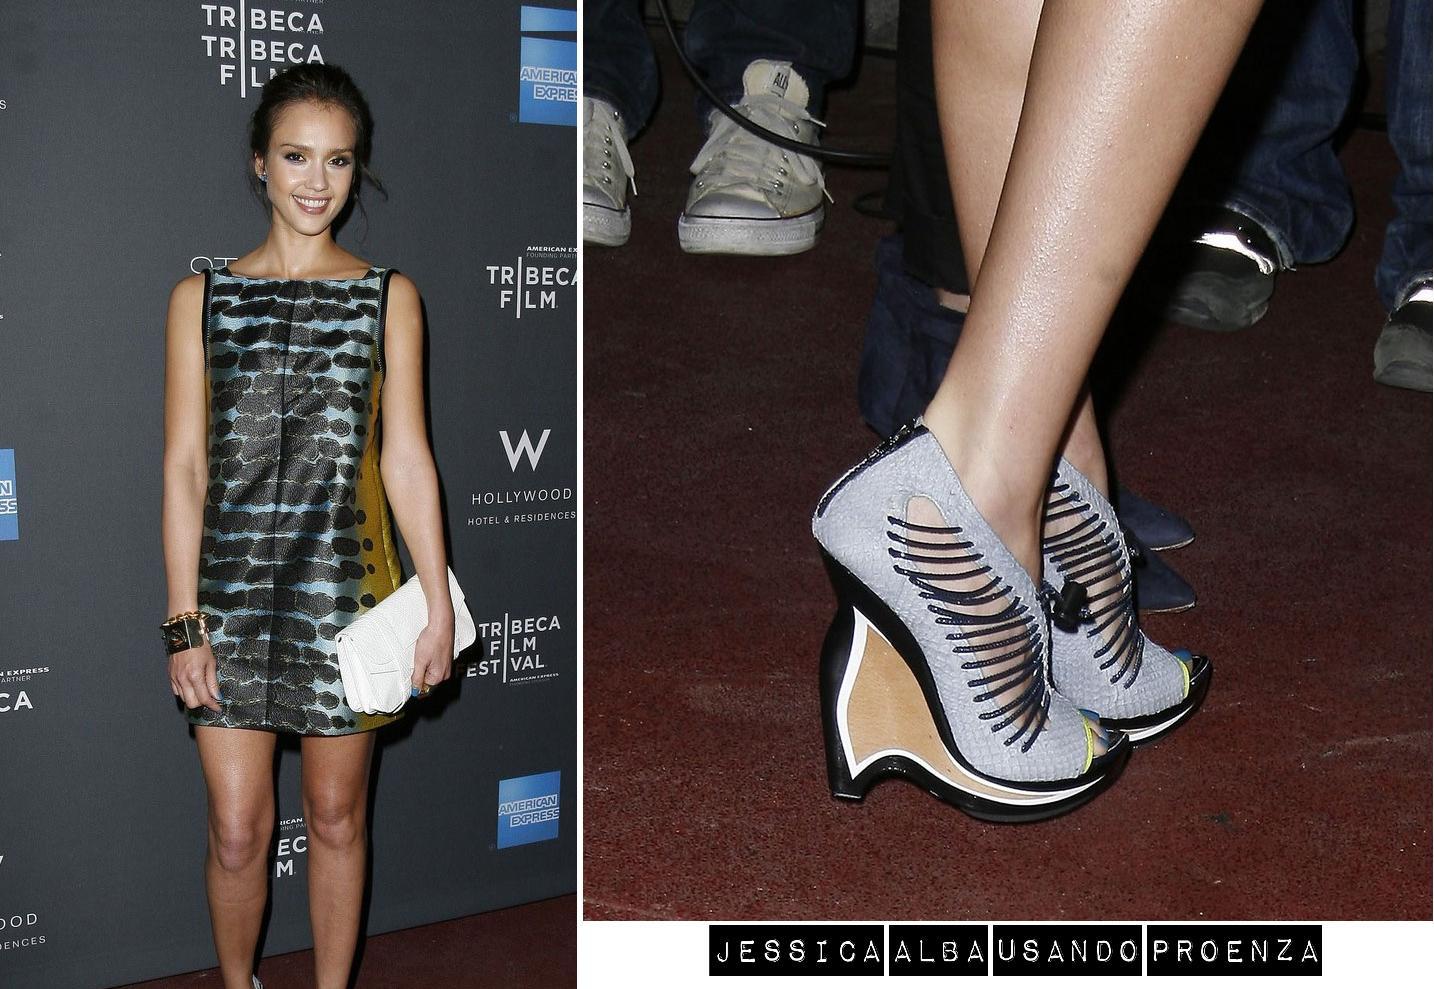 http://3.bp.blogspot.com/-kucTeMuCYaU/TdEfj8EtAYI/AAAAAAAAB_I/NY3v4dQugqM/s1600/proenza-alba-jessica-anabela-tiras-cinza-claro-grey-sapato-multicolorido-nova-york-colors-shoes-diferentes-modernos-famosas-celebridades-moda-fashion-lindos-chamativos.jpg